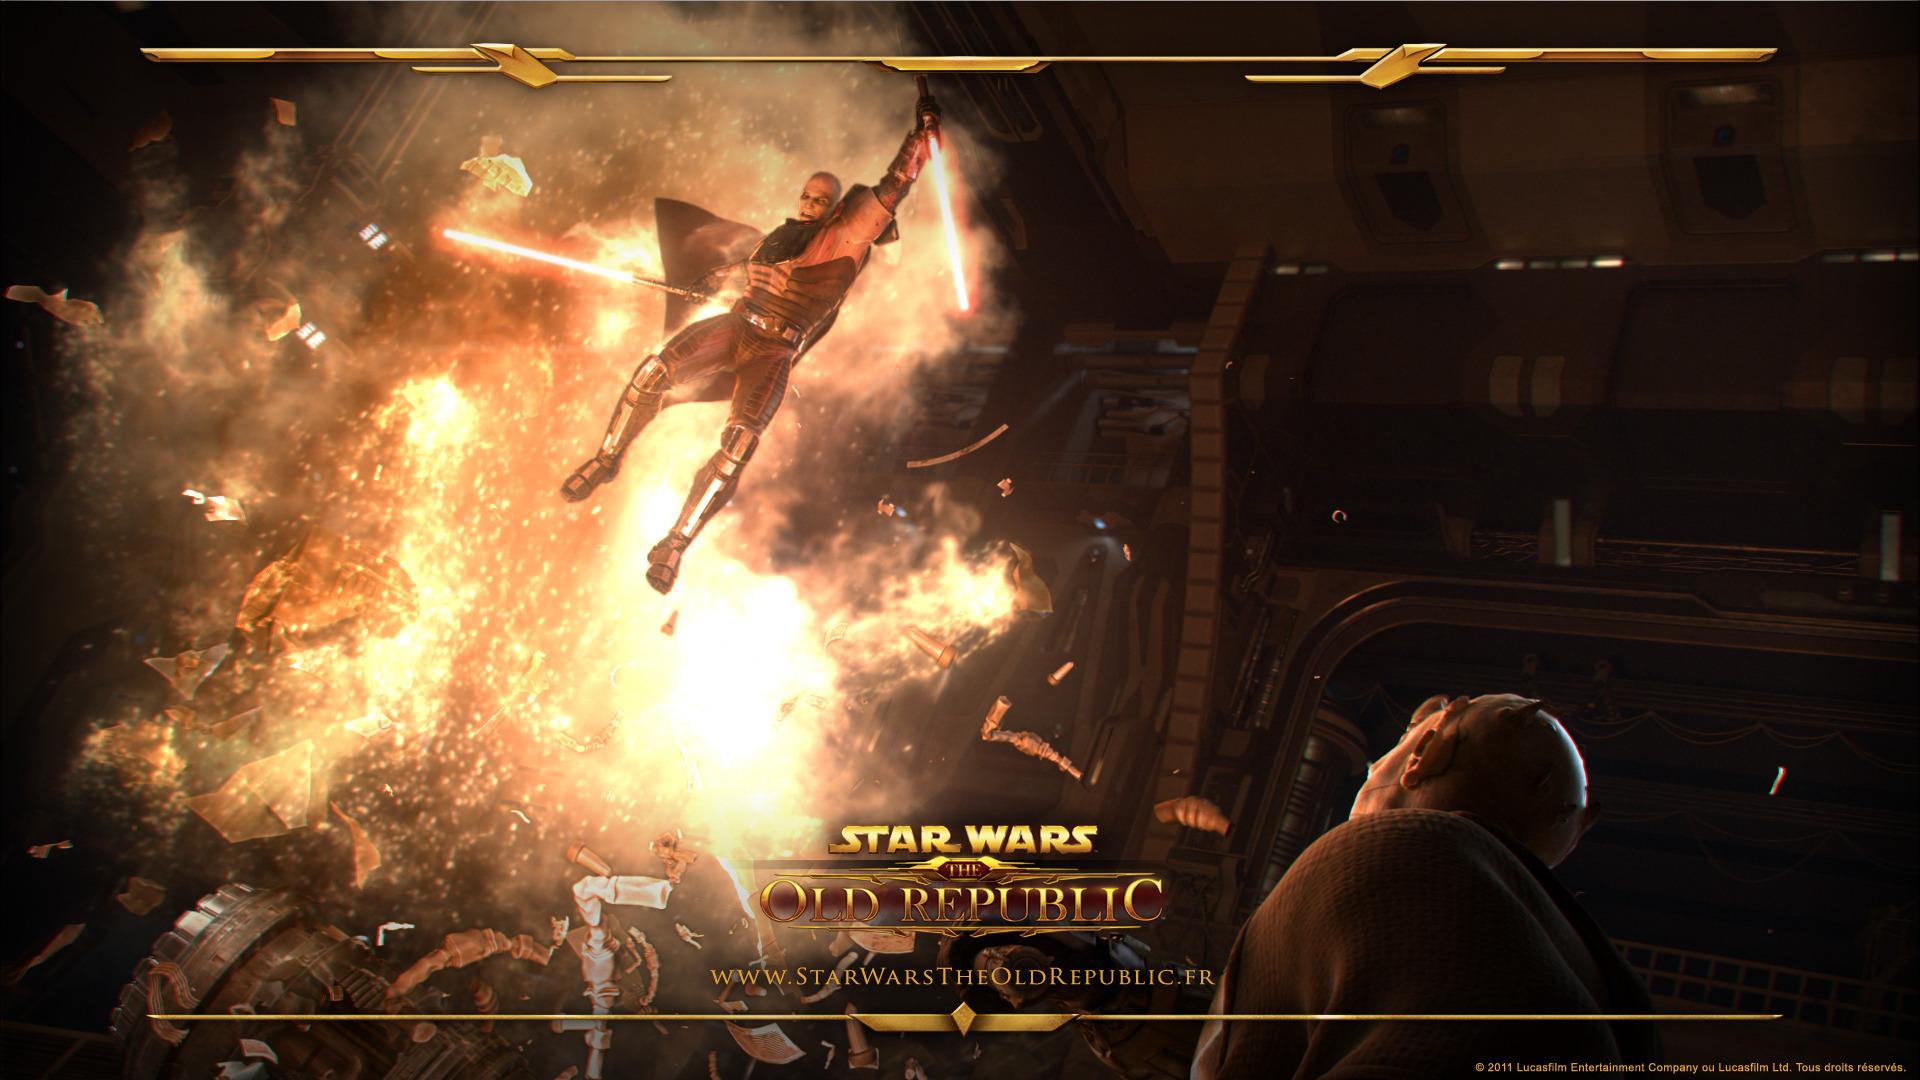 Free Download Fond Dcran Du Jeu Star Wars The Old Republic